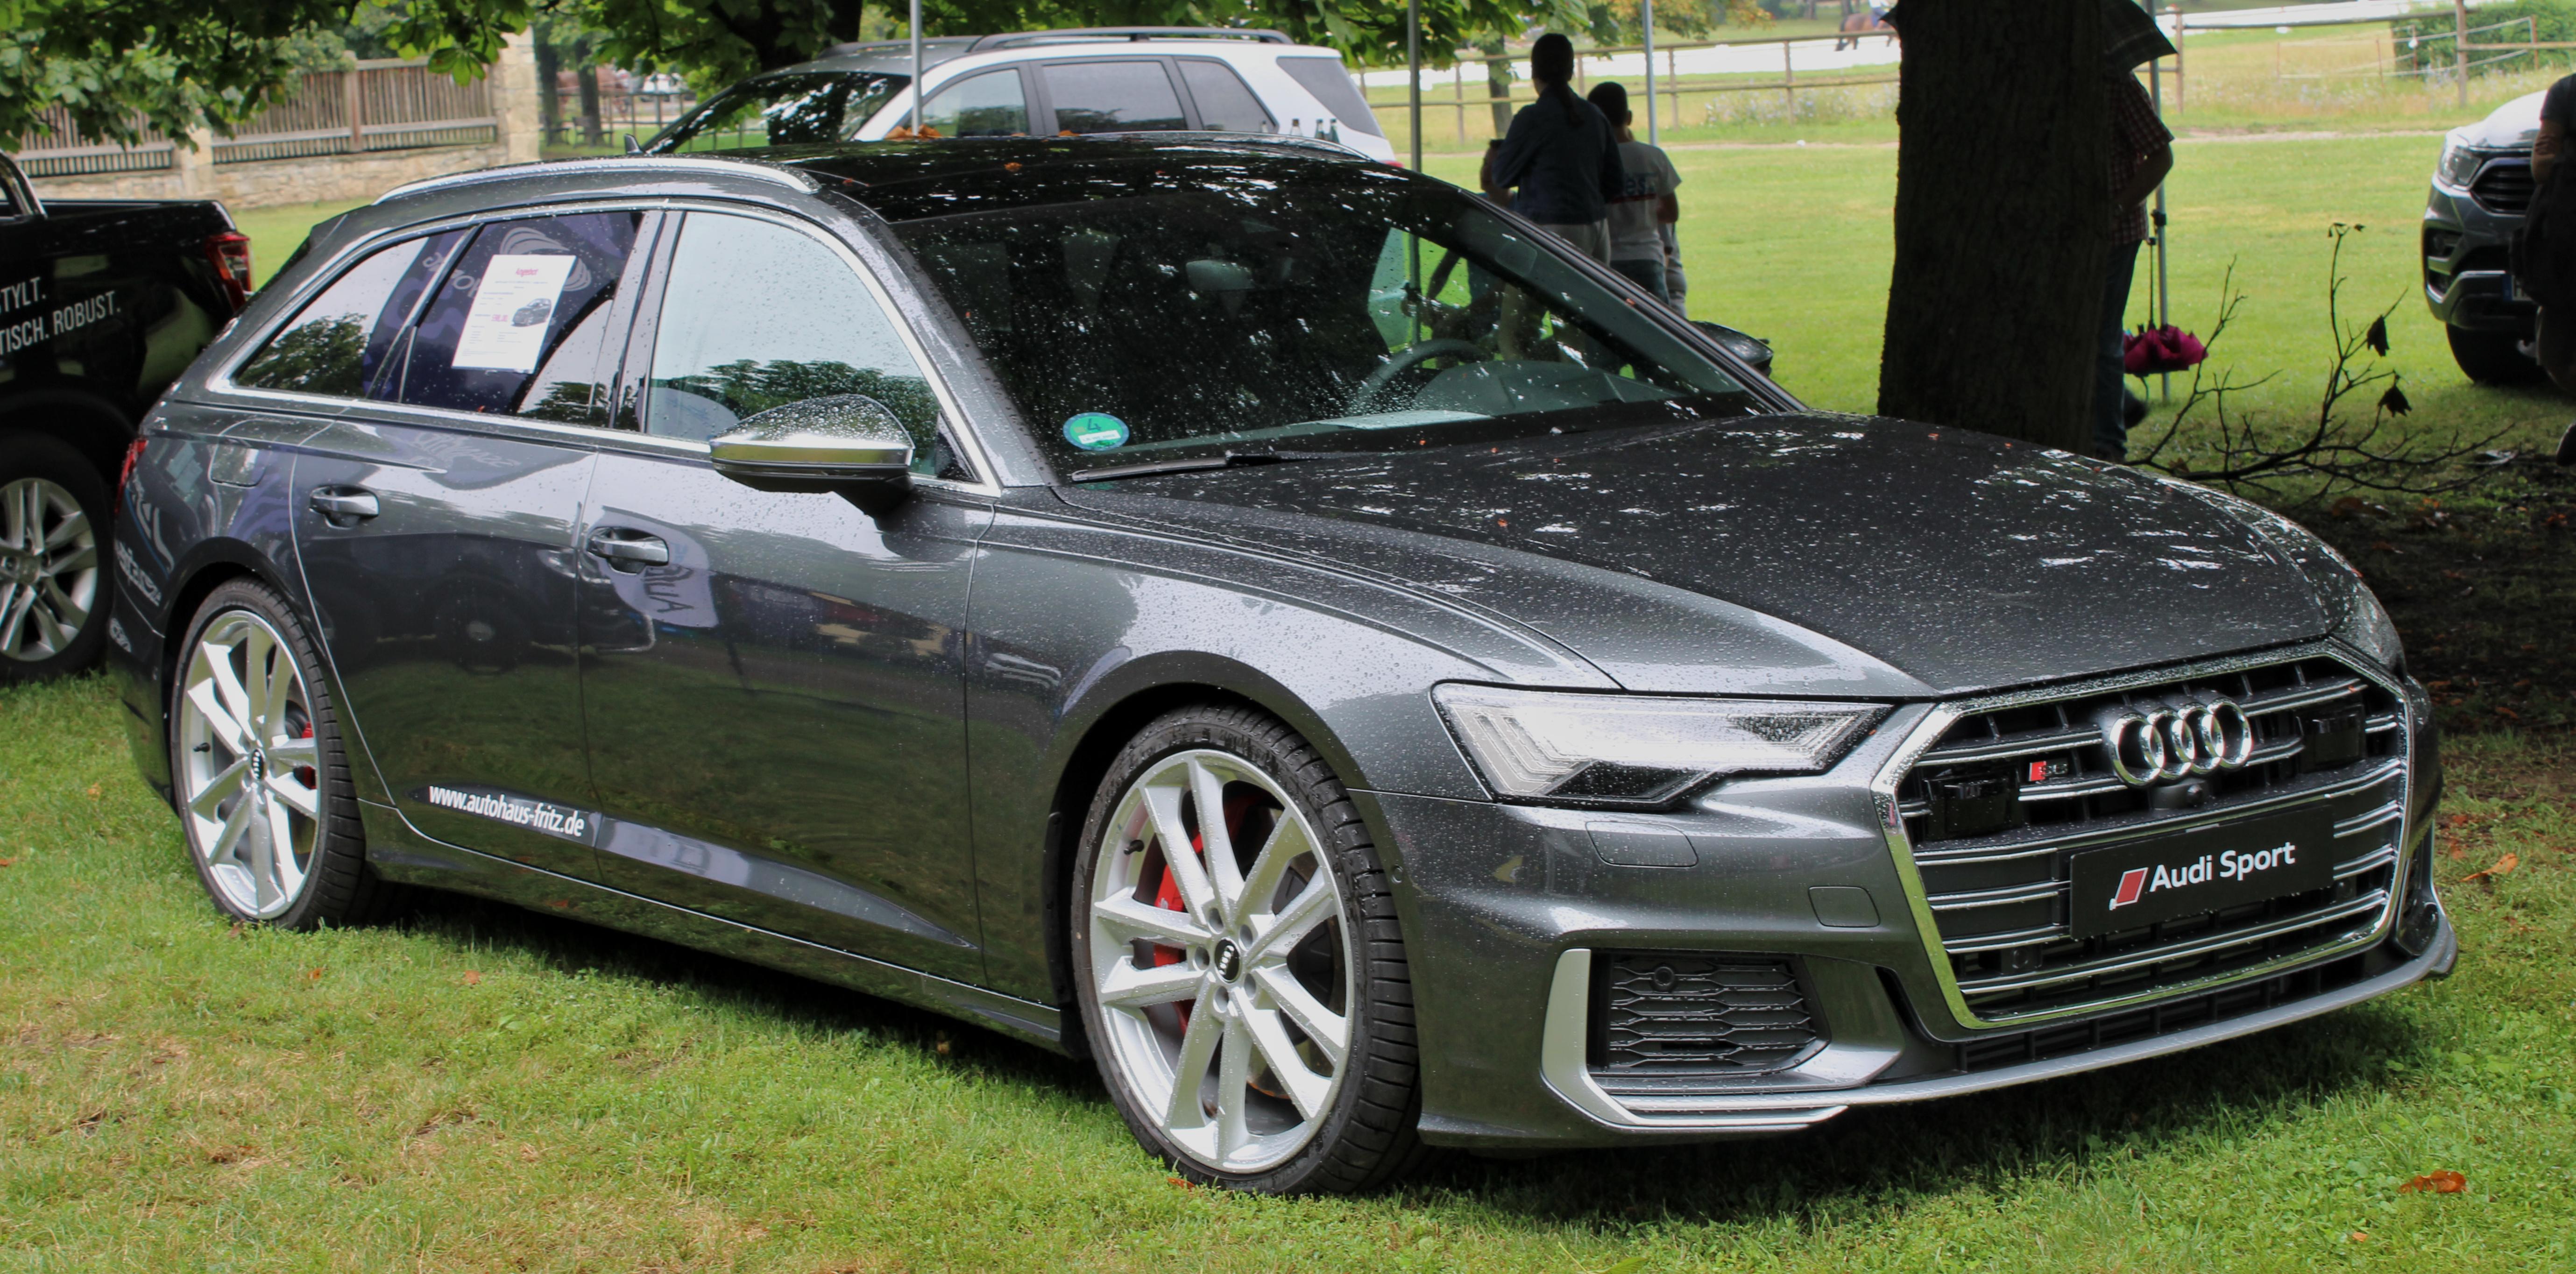 Kekurangan Audi S6 Tangguh